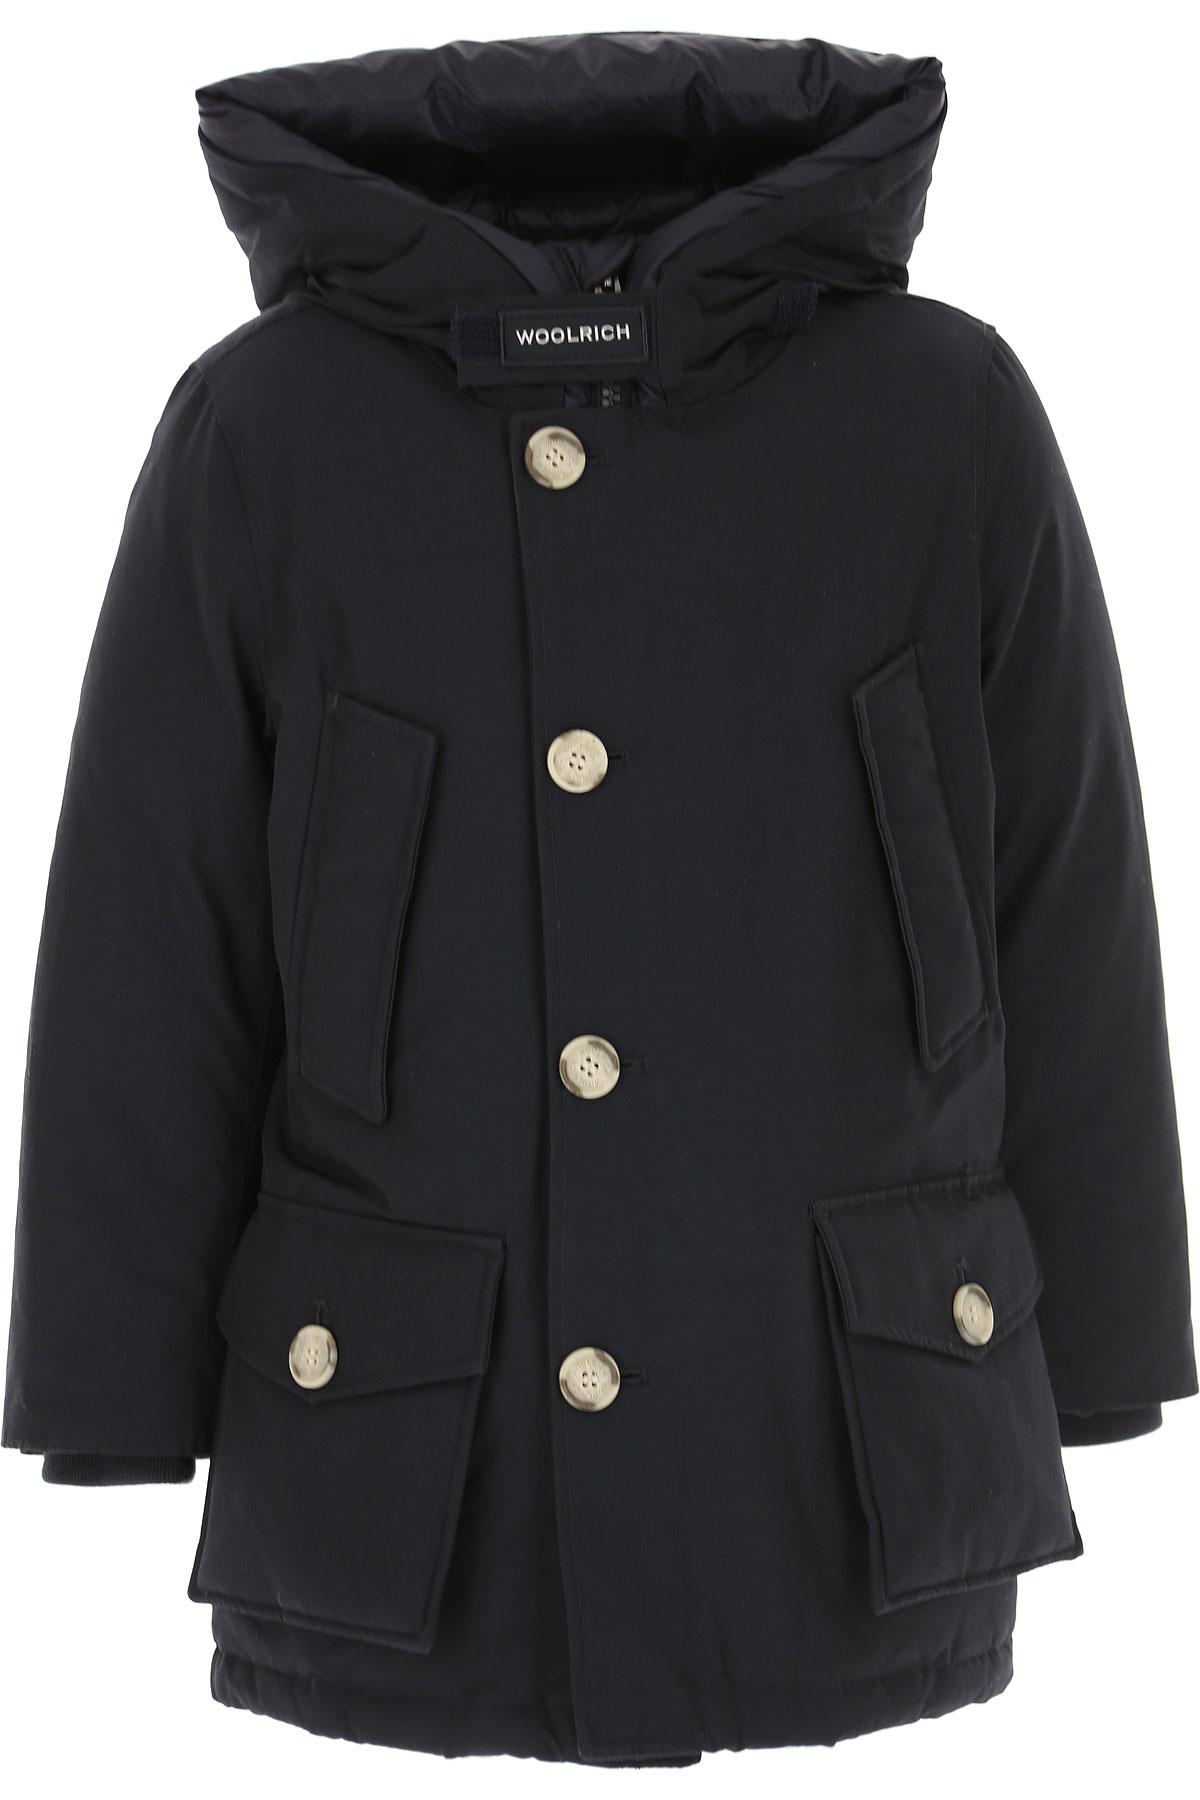 Woolrich Boys Down Jacket for Kids, Puffer Ski Jacket On Sale, Dark Blue Navy, Ctton, 2019, 10Y 12Y